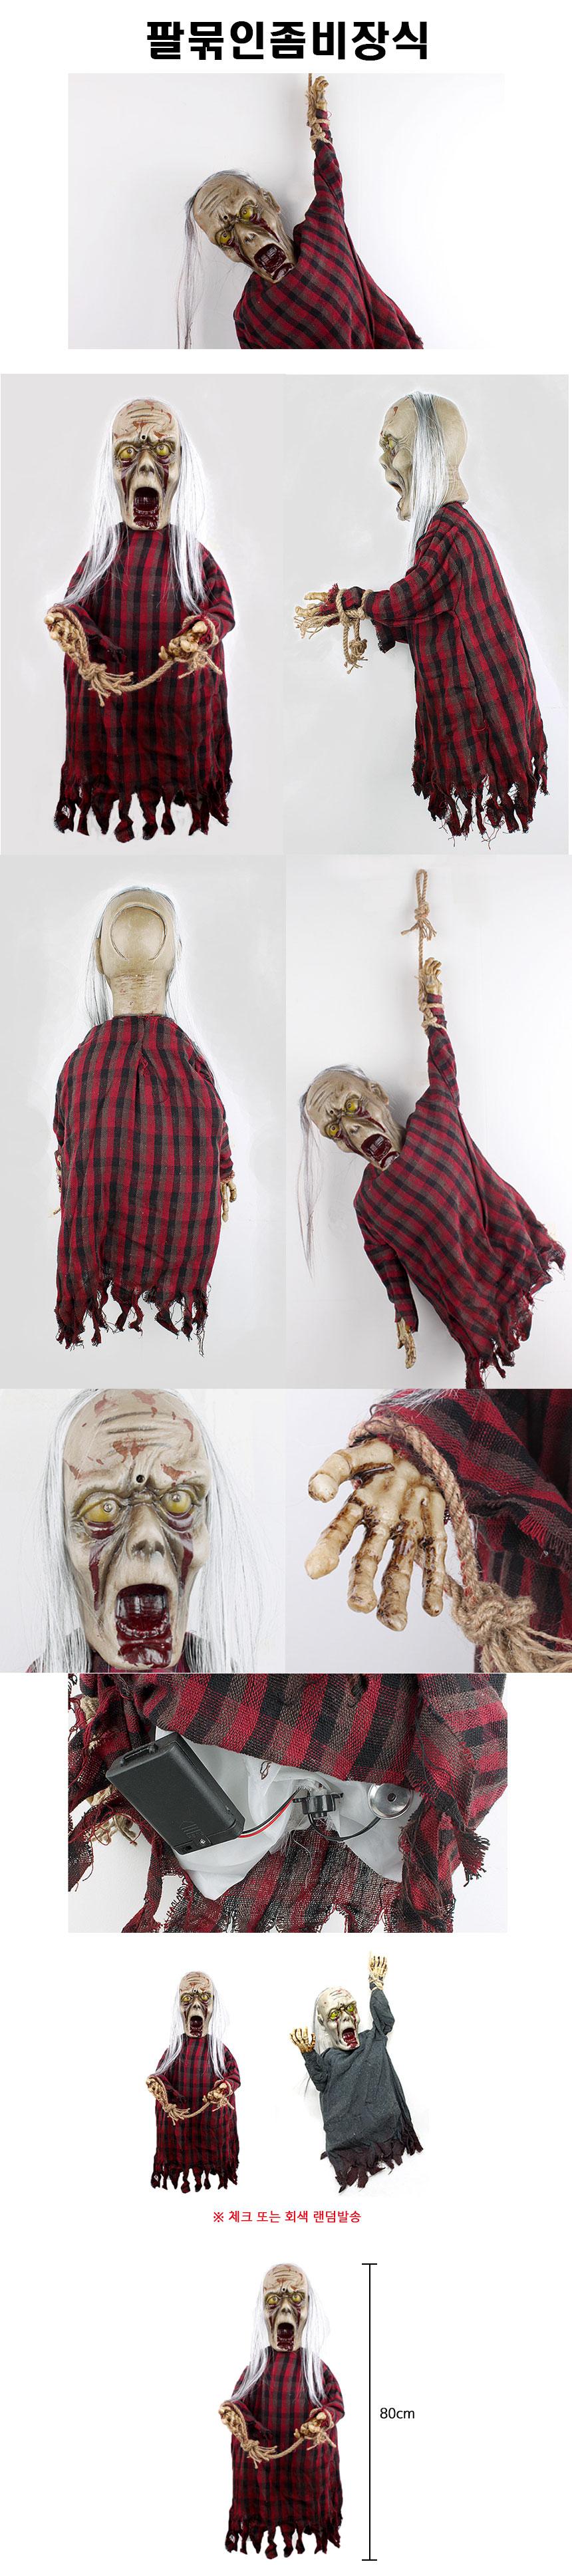 http://partyb2b.mireene.kr/img/party/Halloween/arm-bound-zombie.jpg